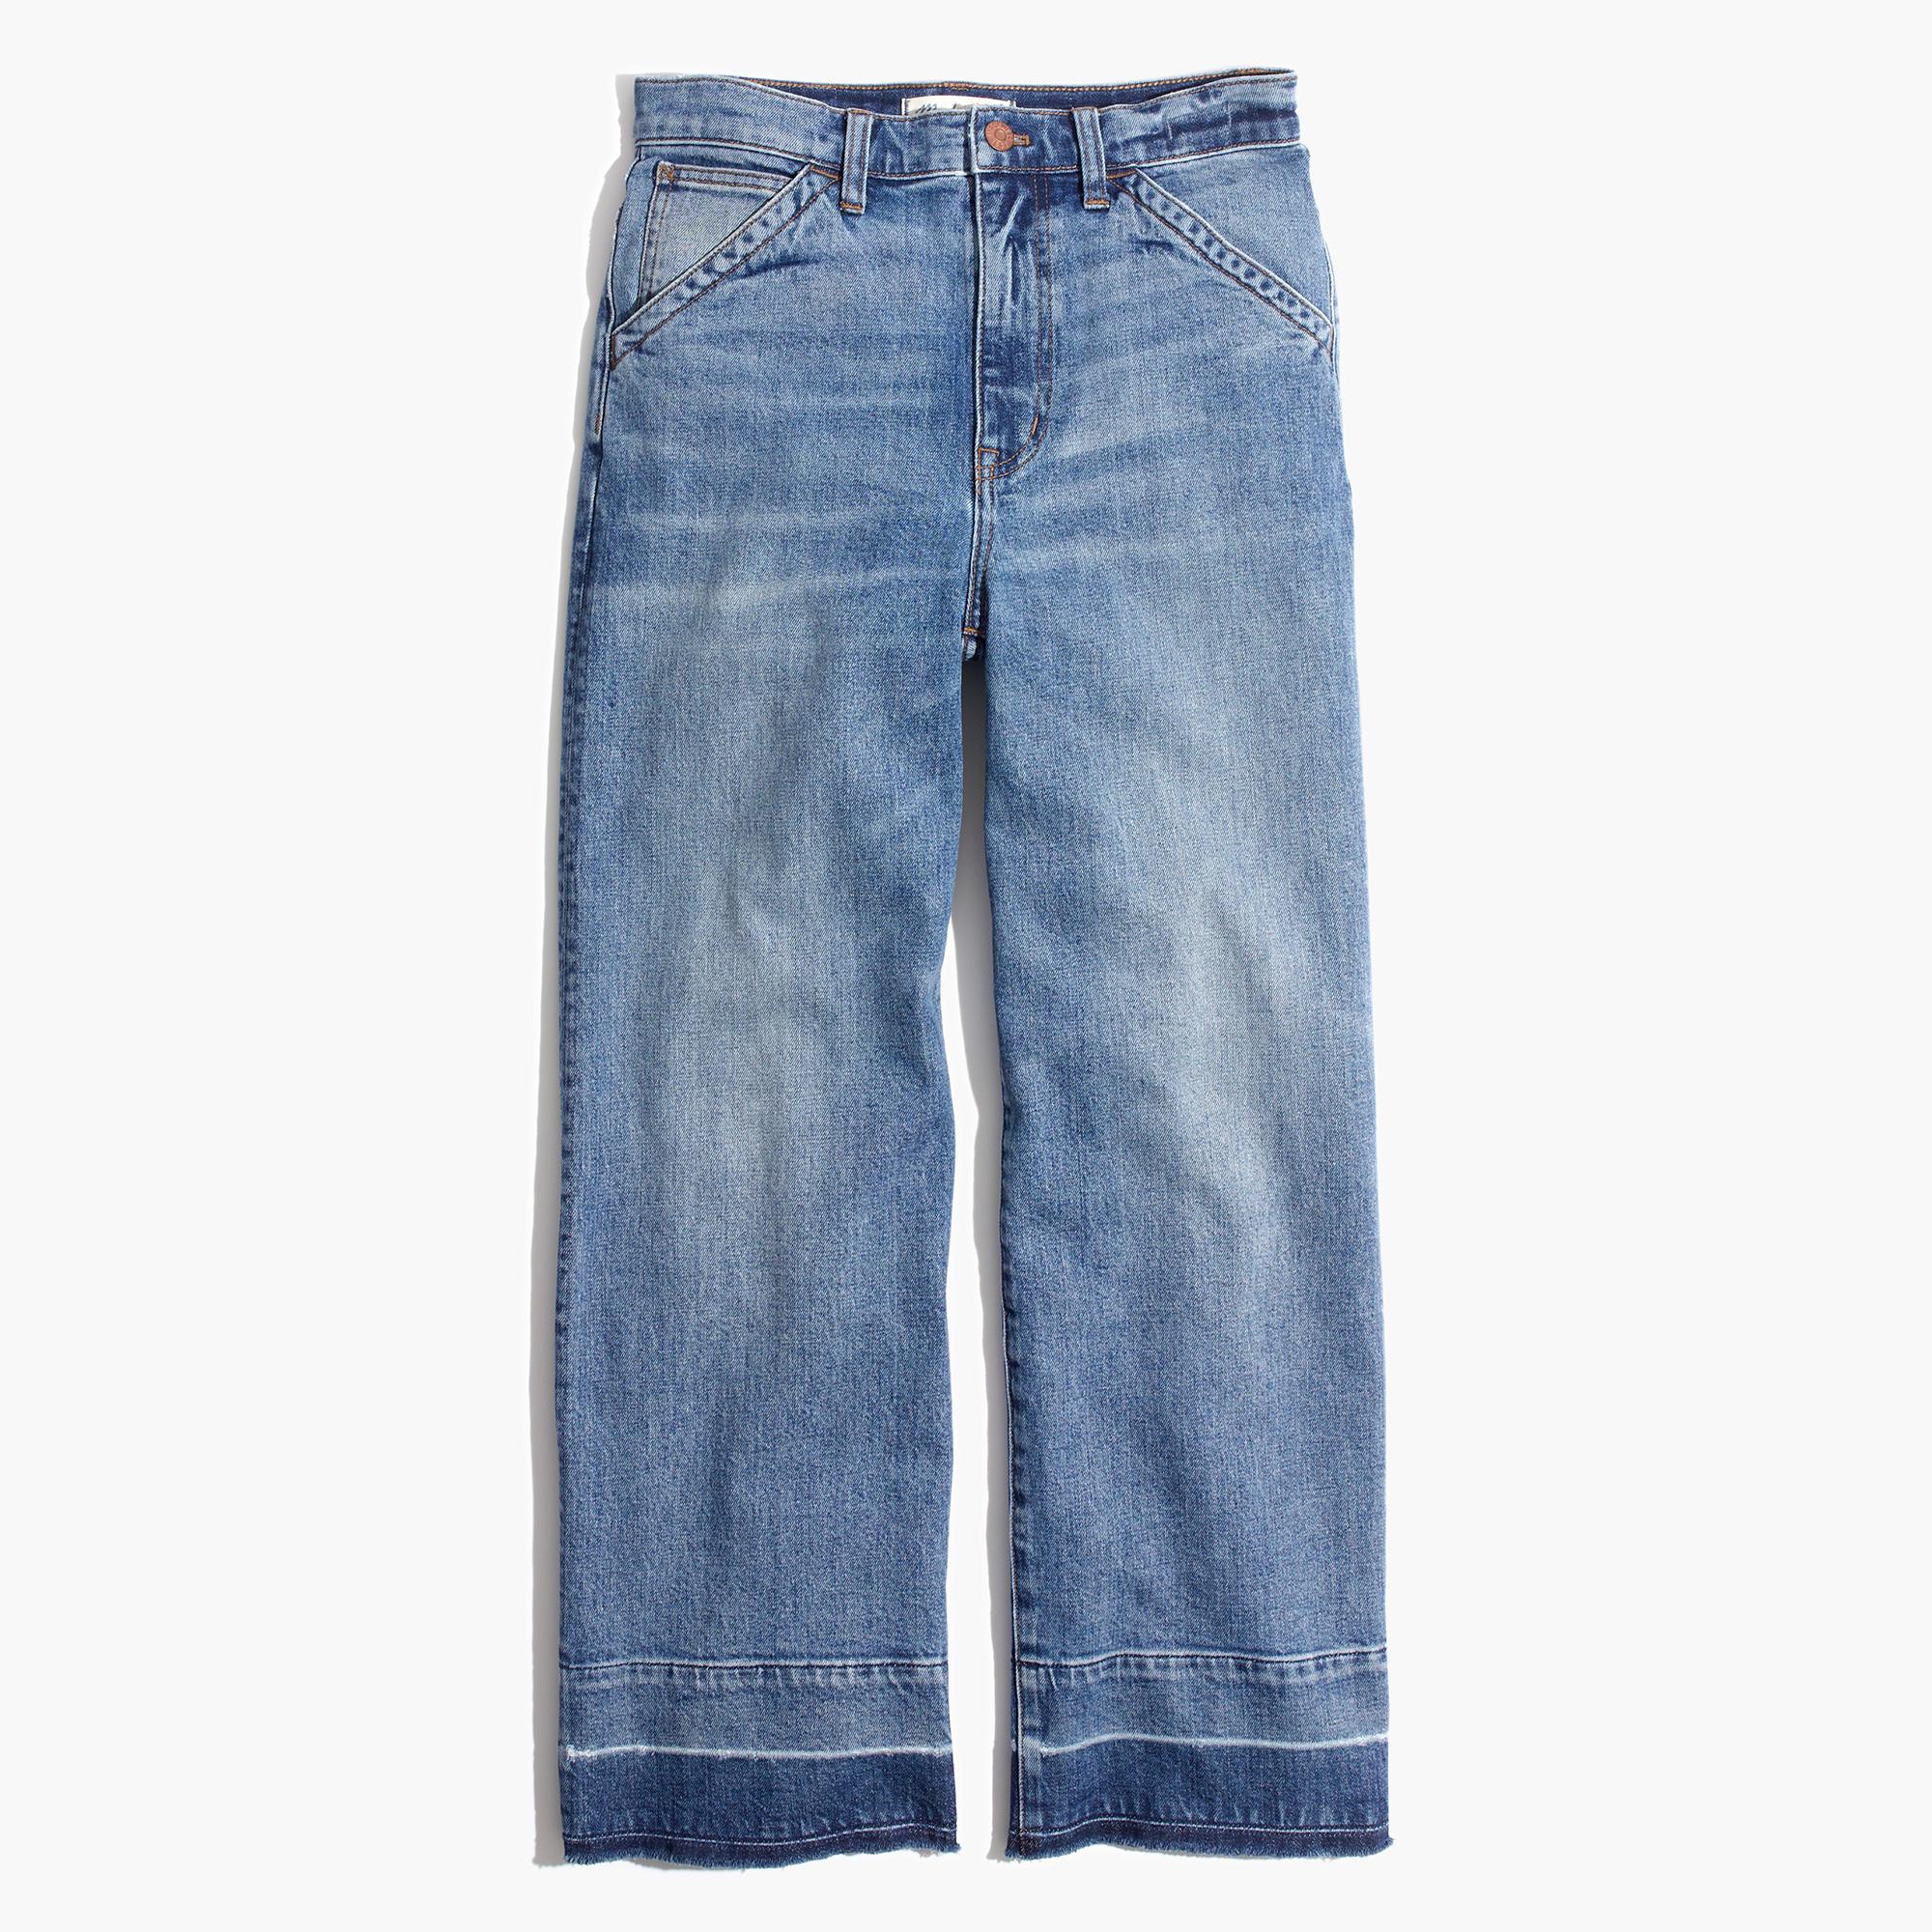 7. madewell jeans.jpg